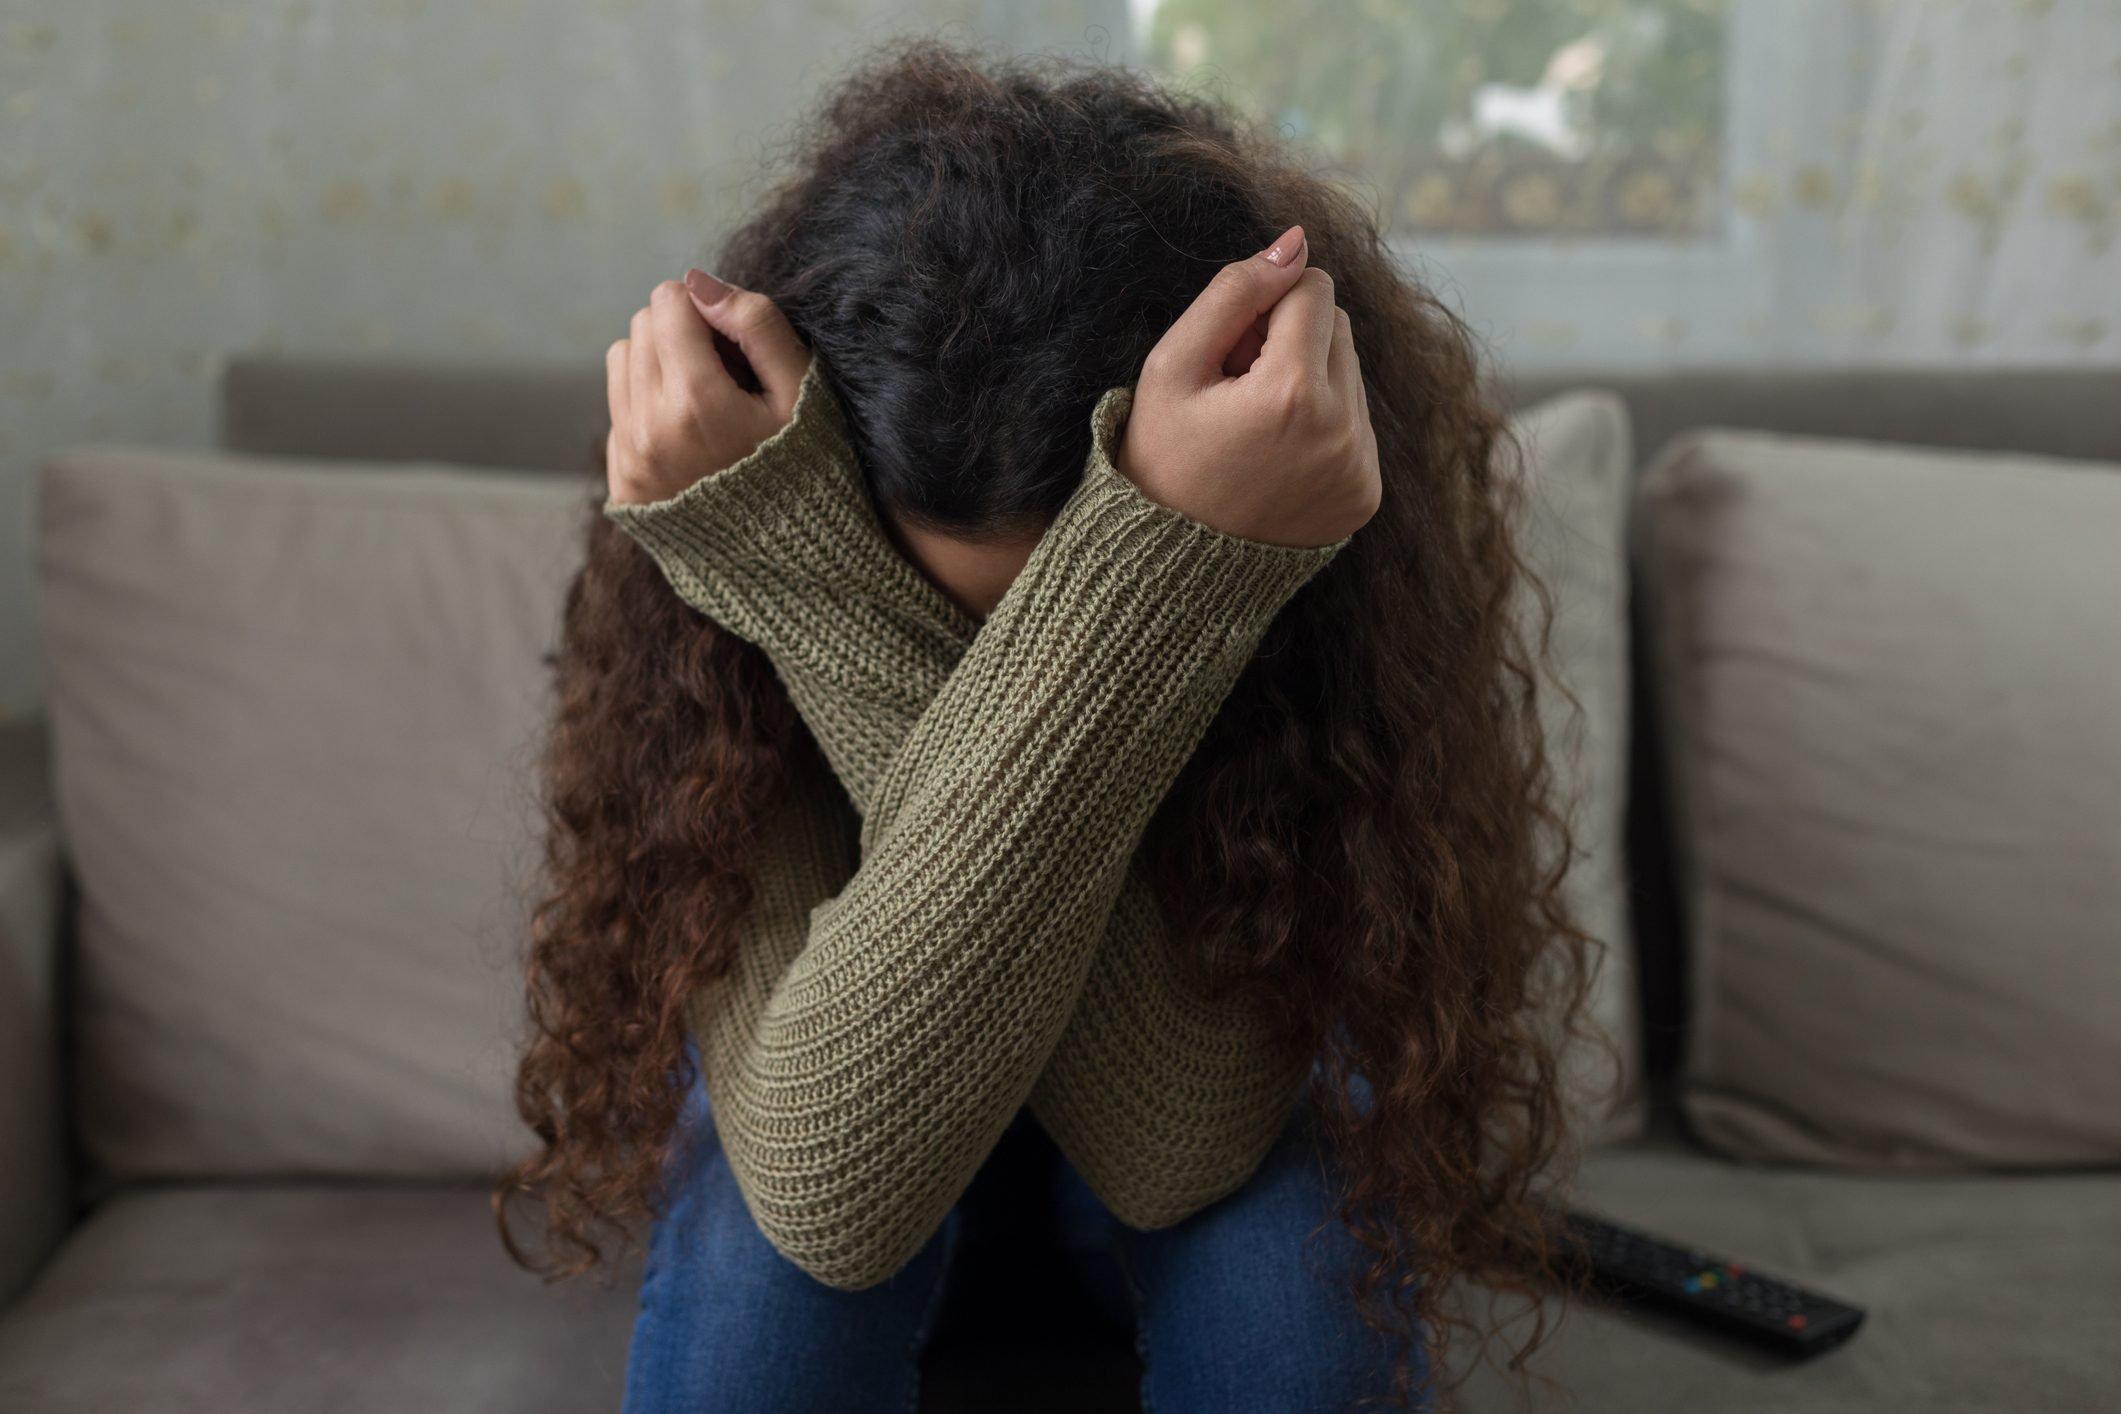 girl having a panic attack